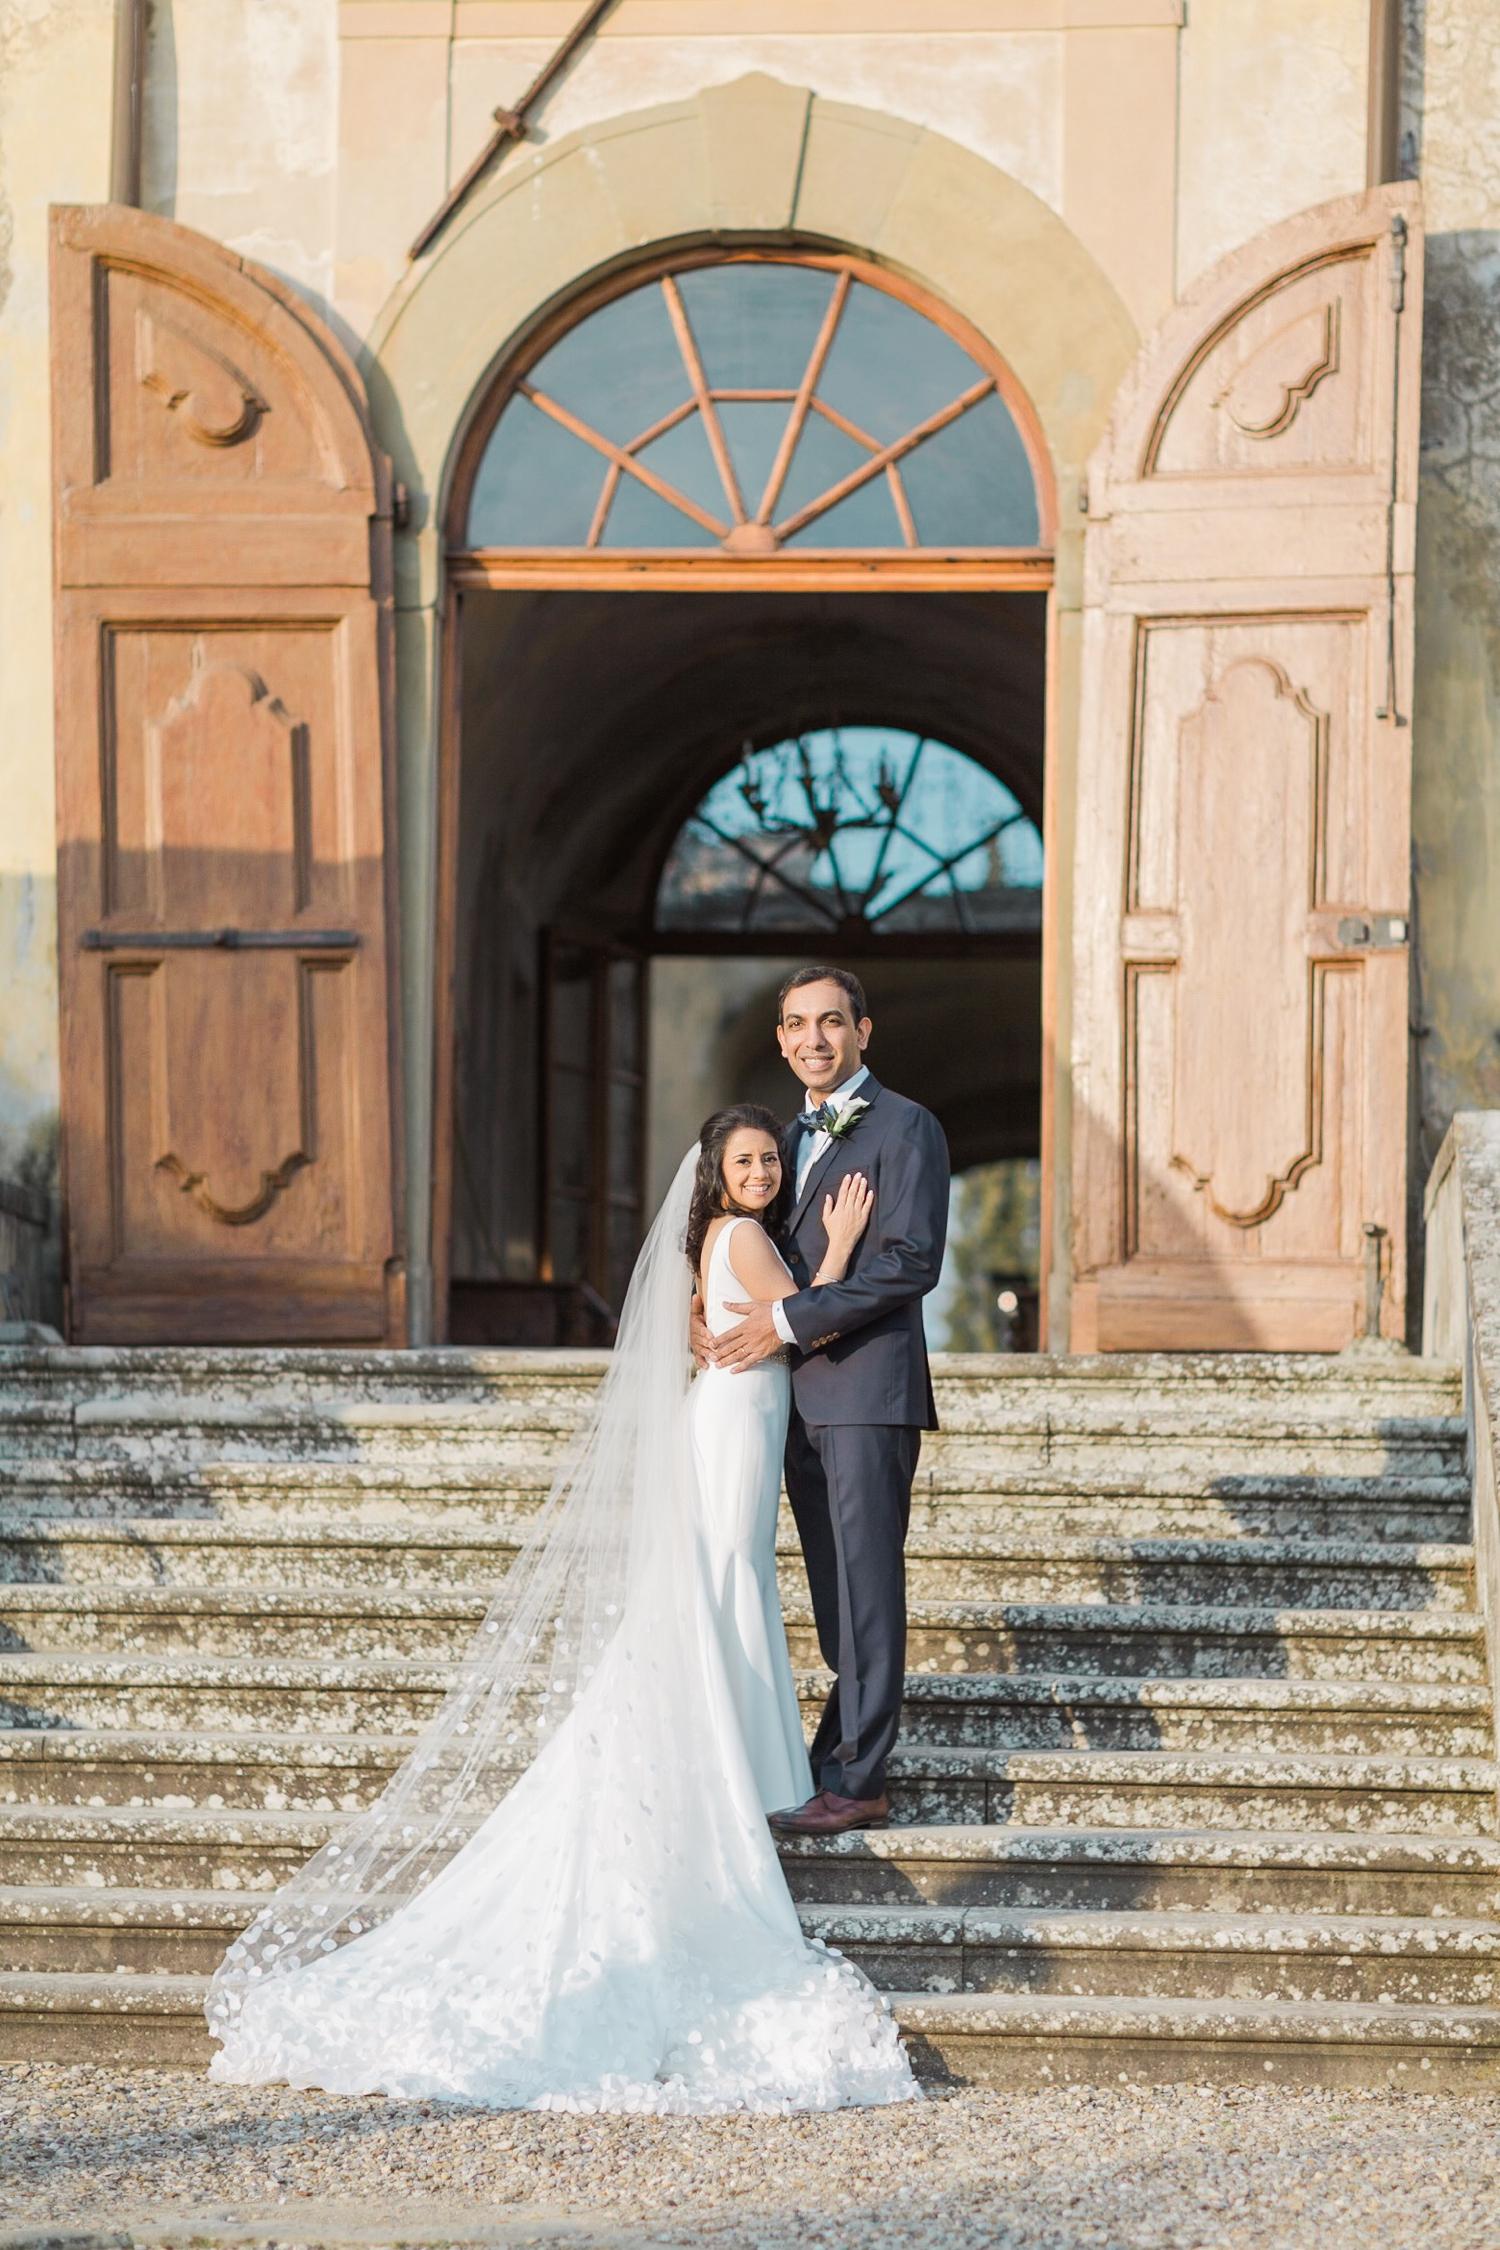 fine-art-film-florence-italy-wedding-photographer-villa-medicea-di-lilliano_3278.jpg